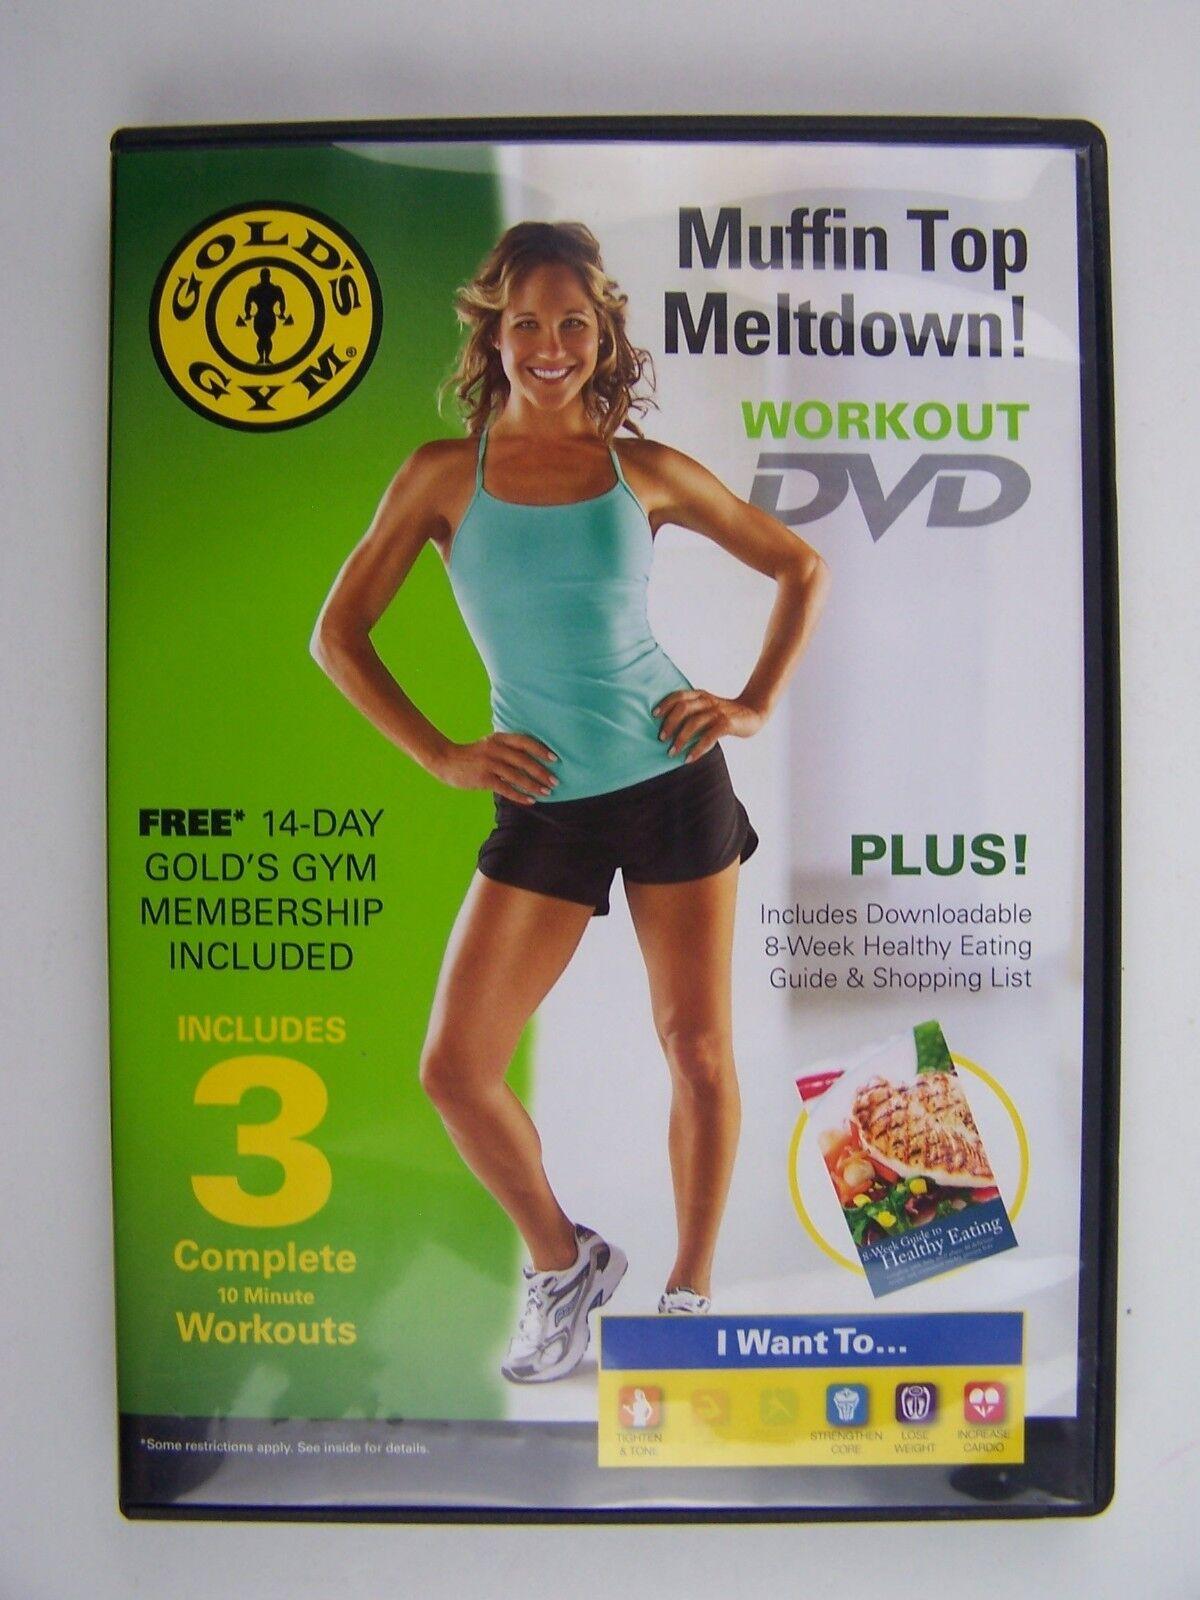 Gold's Gym Muffin Top Meltdown DVD 74345175112